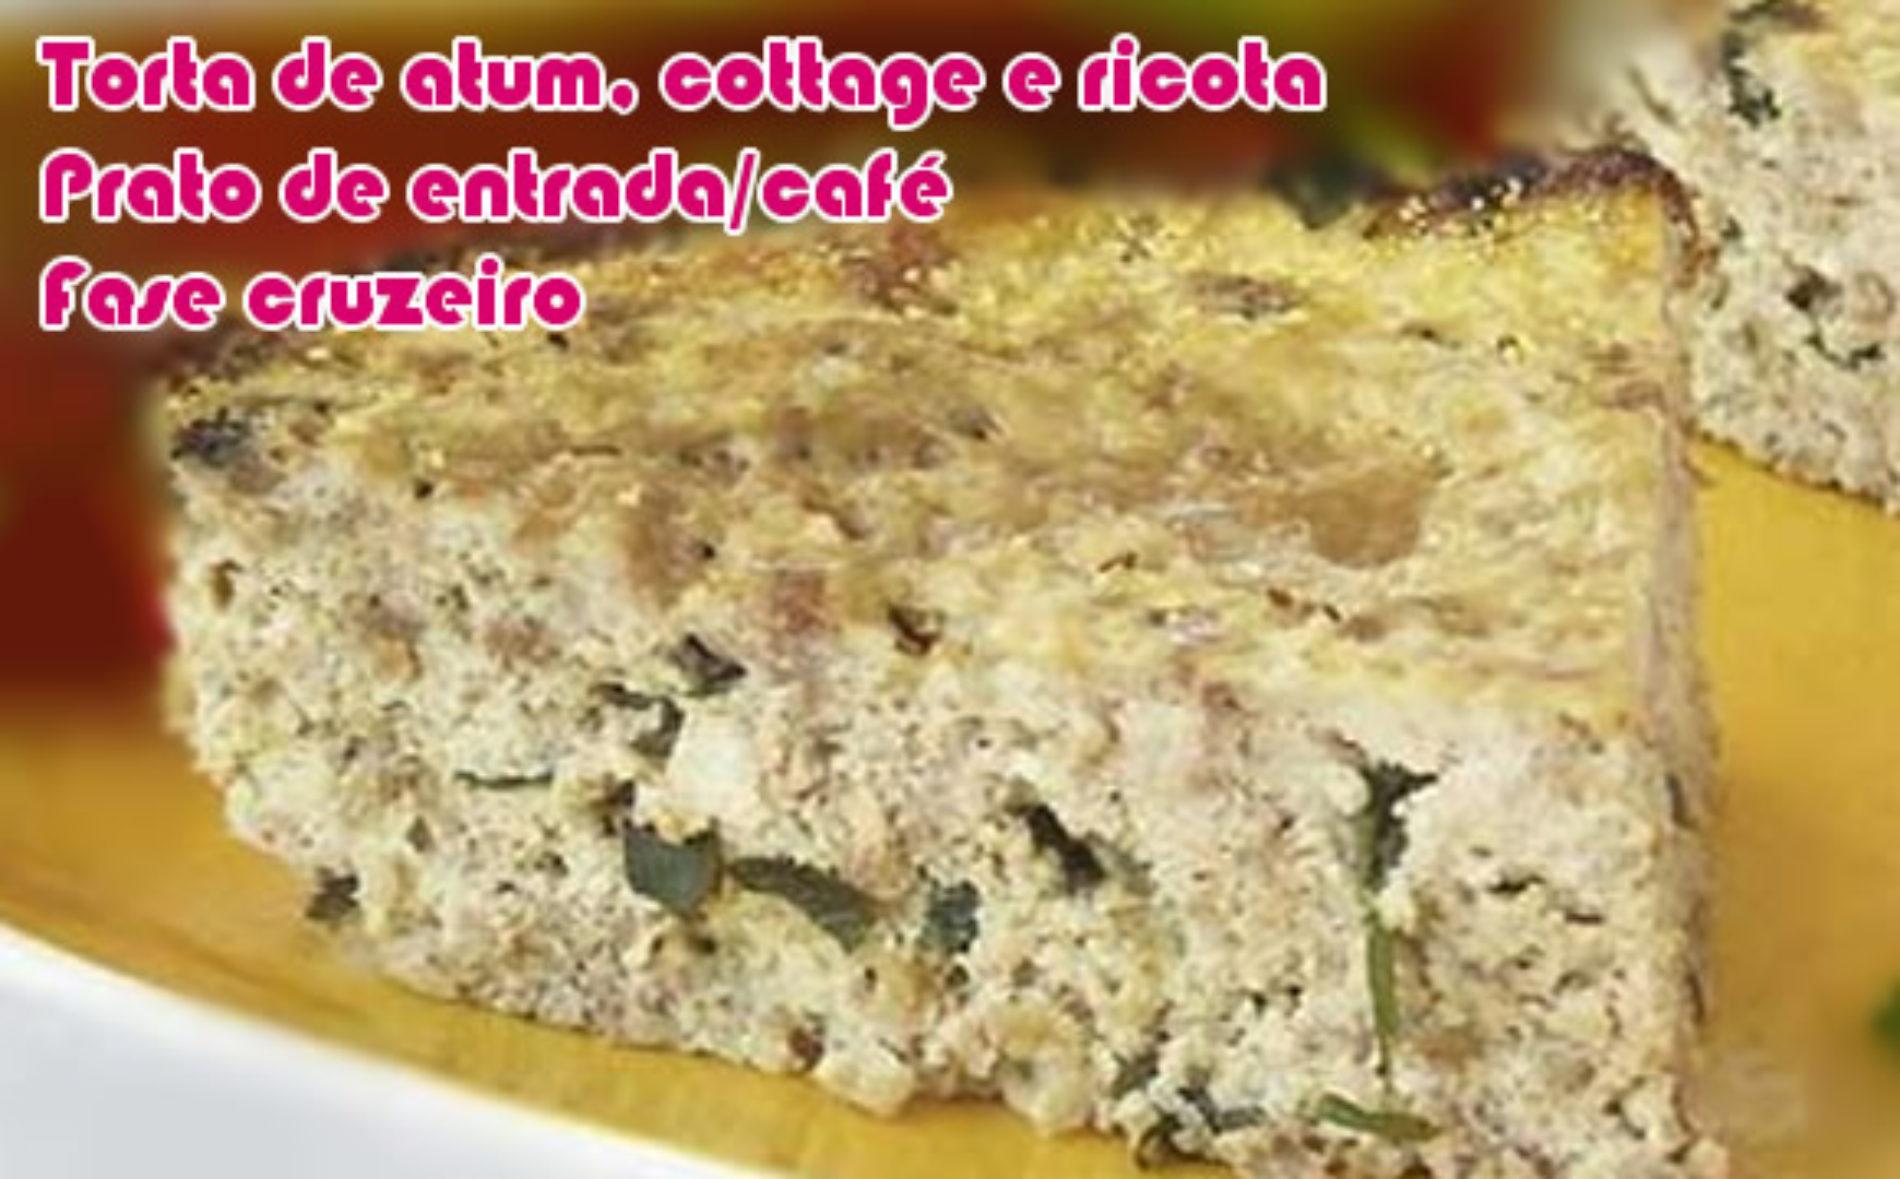 Torta de atum, cottage e ricota